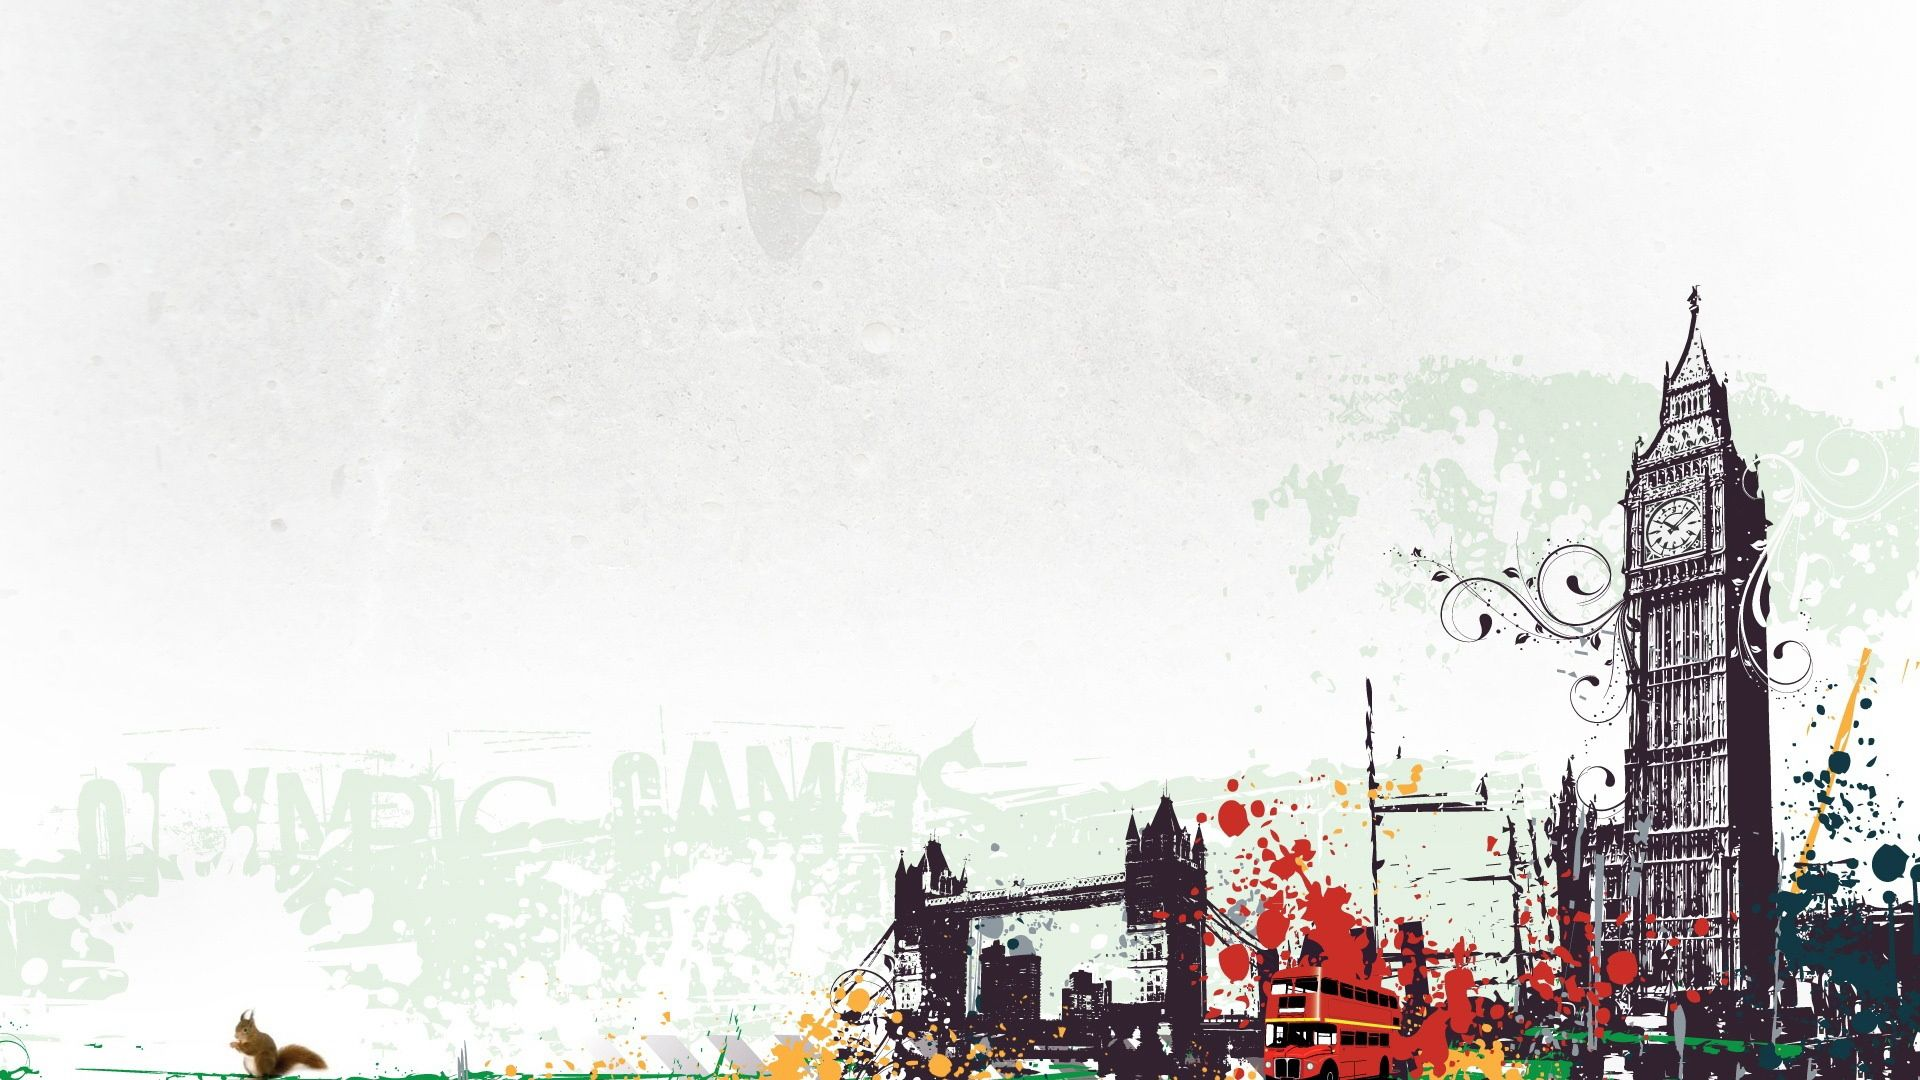 London Illustration Desktop Wallpaper London Wallpaper London Illustration Artistic Wallpaper